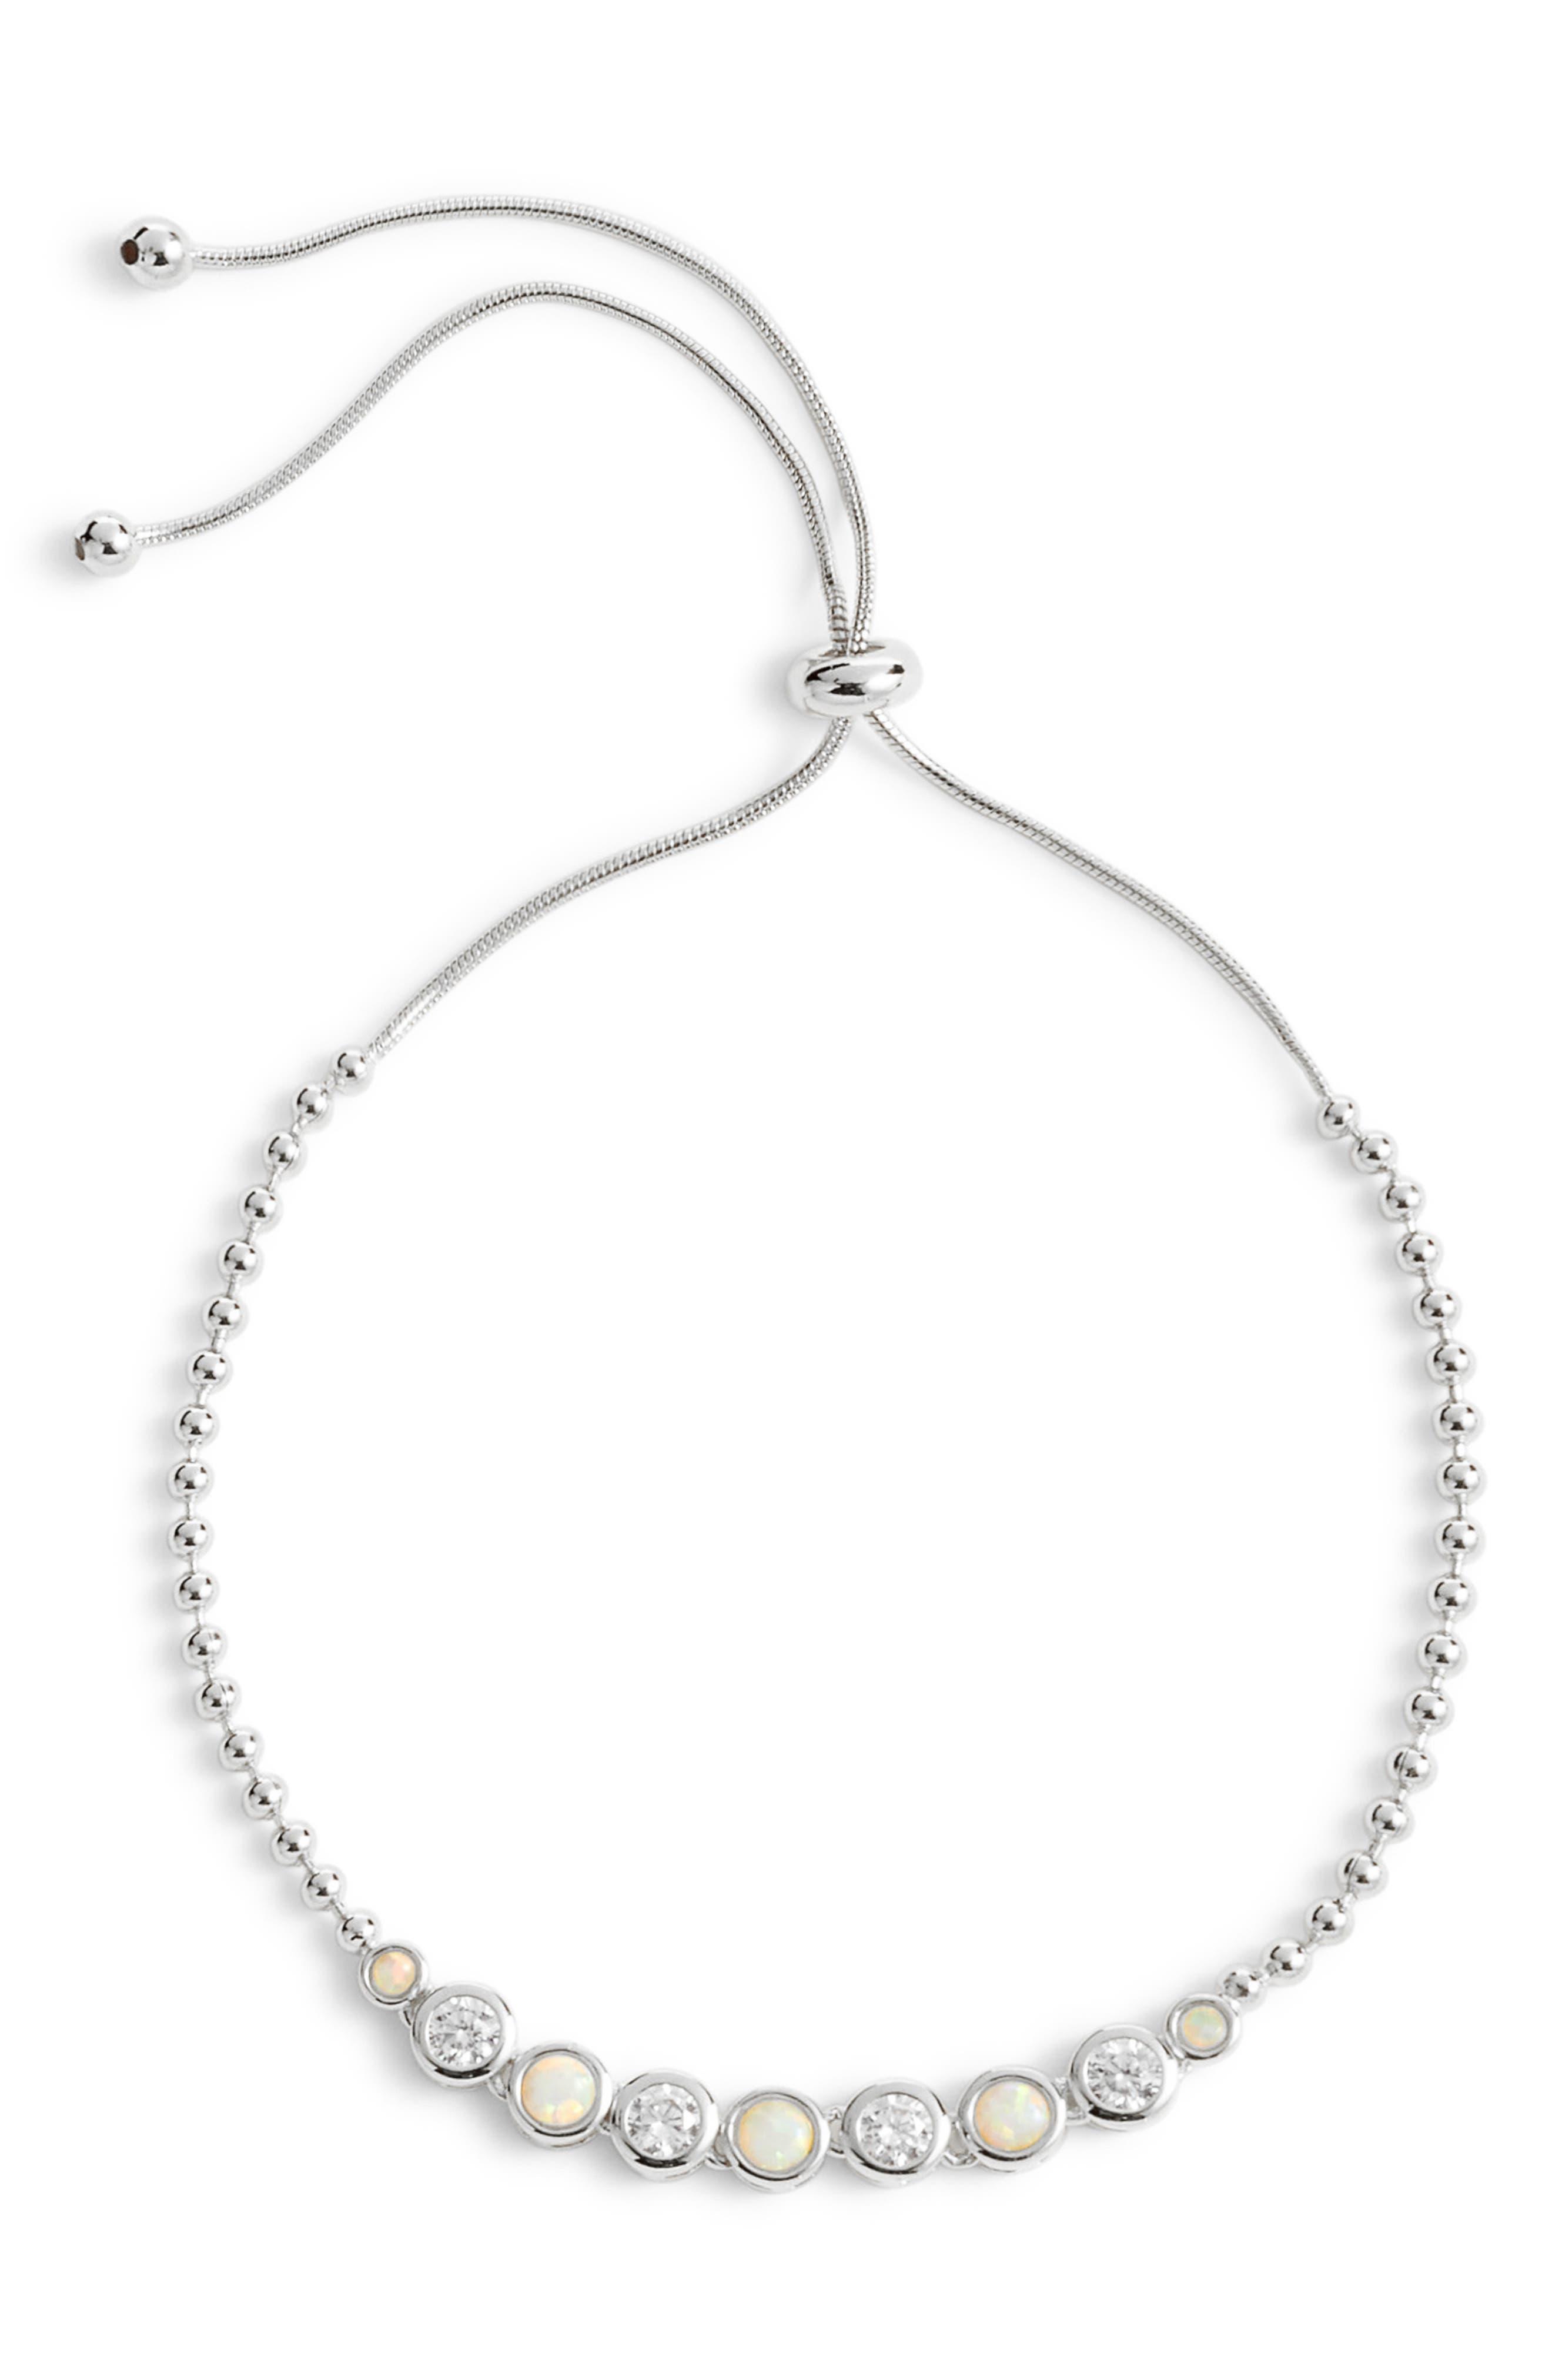 Opal Adjustable Bracelet,                             Main thumbnail 1, color,                             040